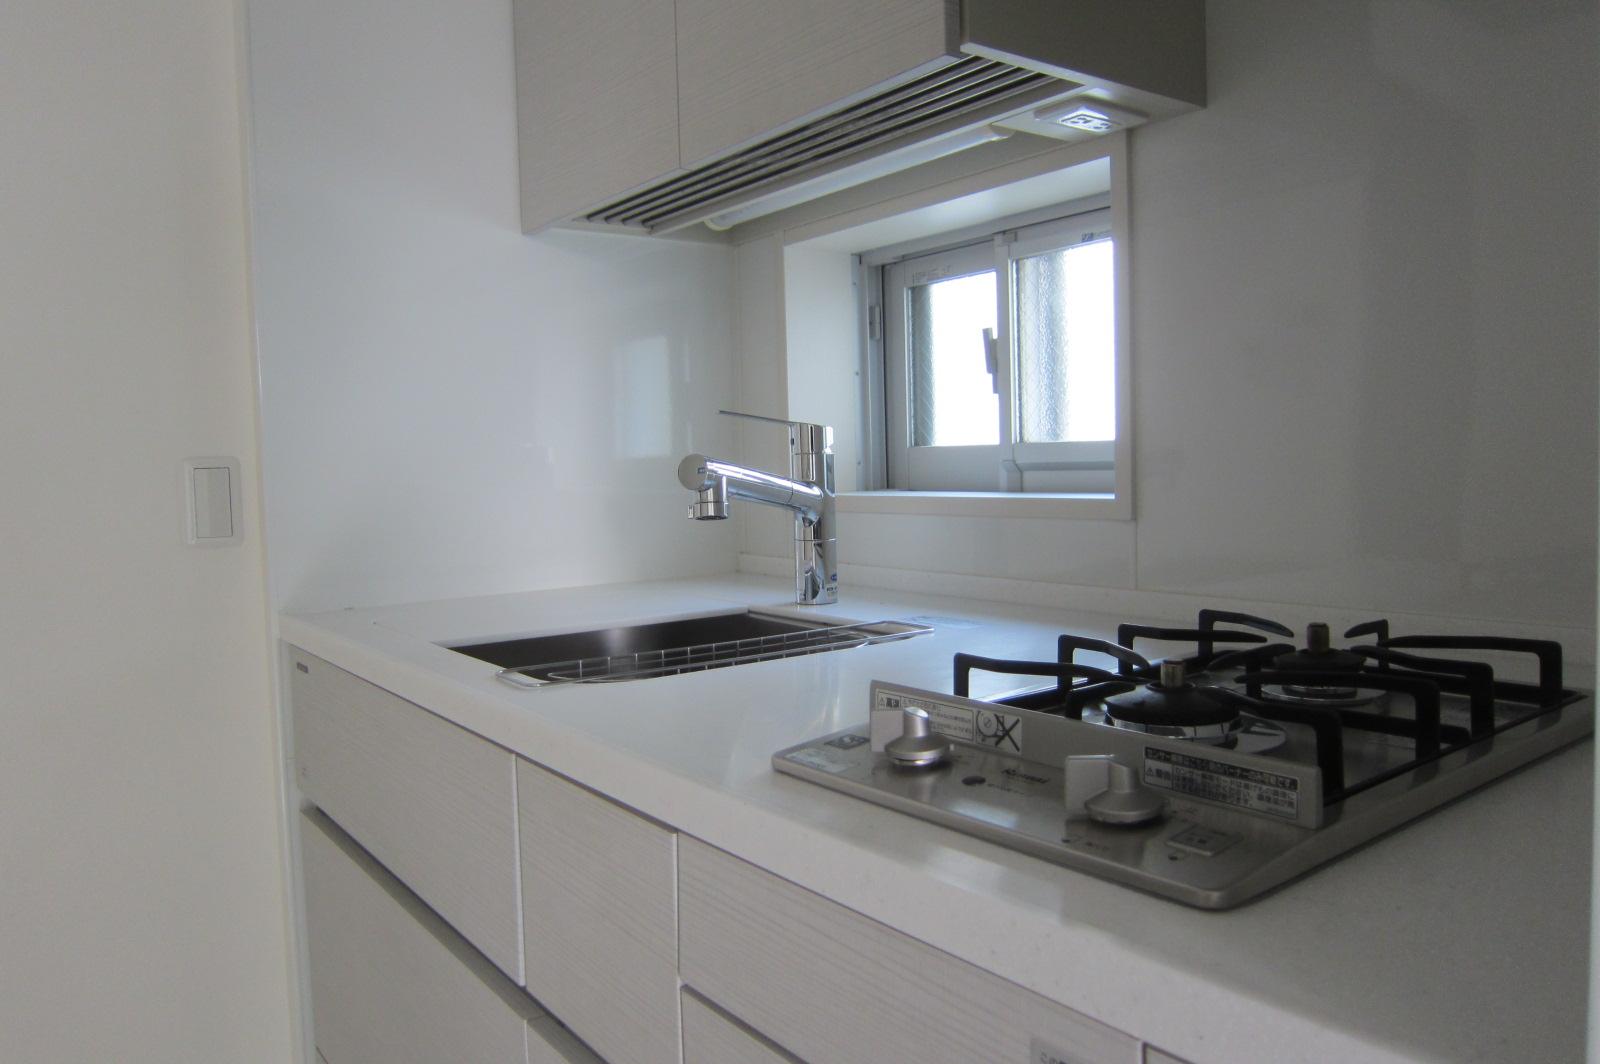 1DK Apartment - Akasaka - Minato-ku - Tokyo - Japan - For ...